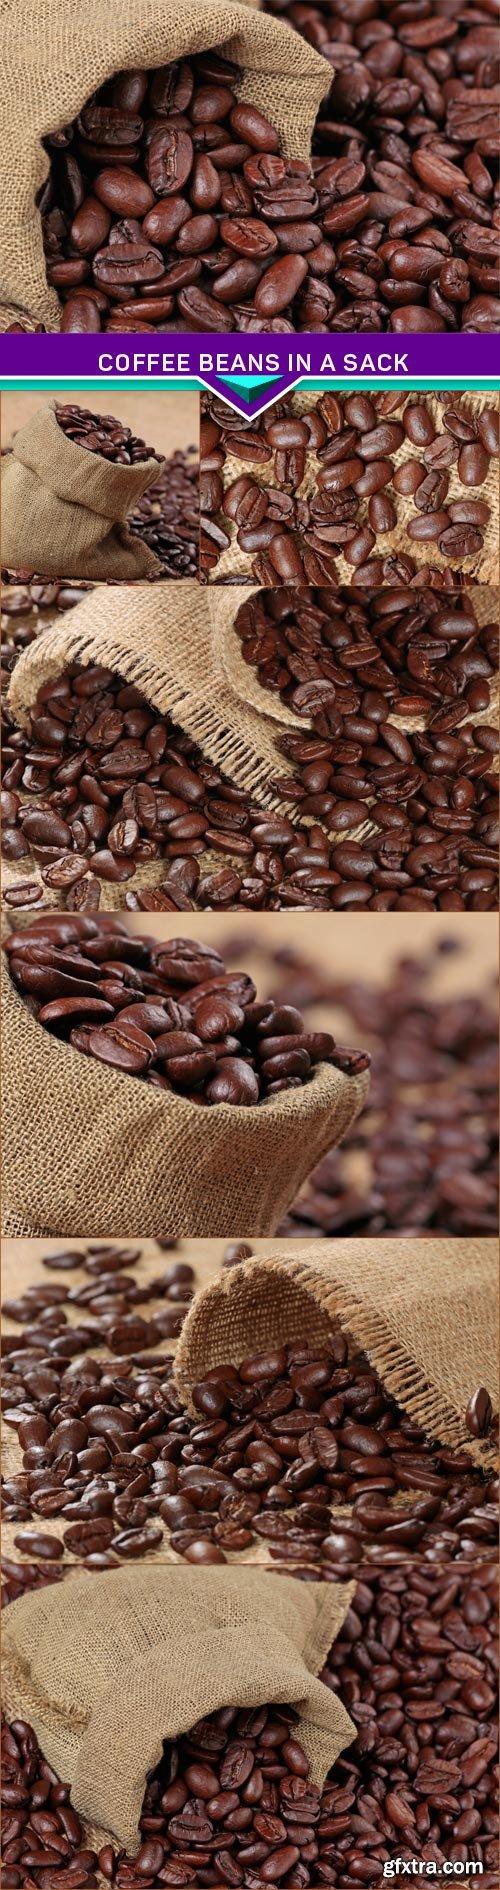 Coffee beans in a sack 7x JPEG